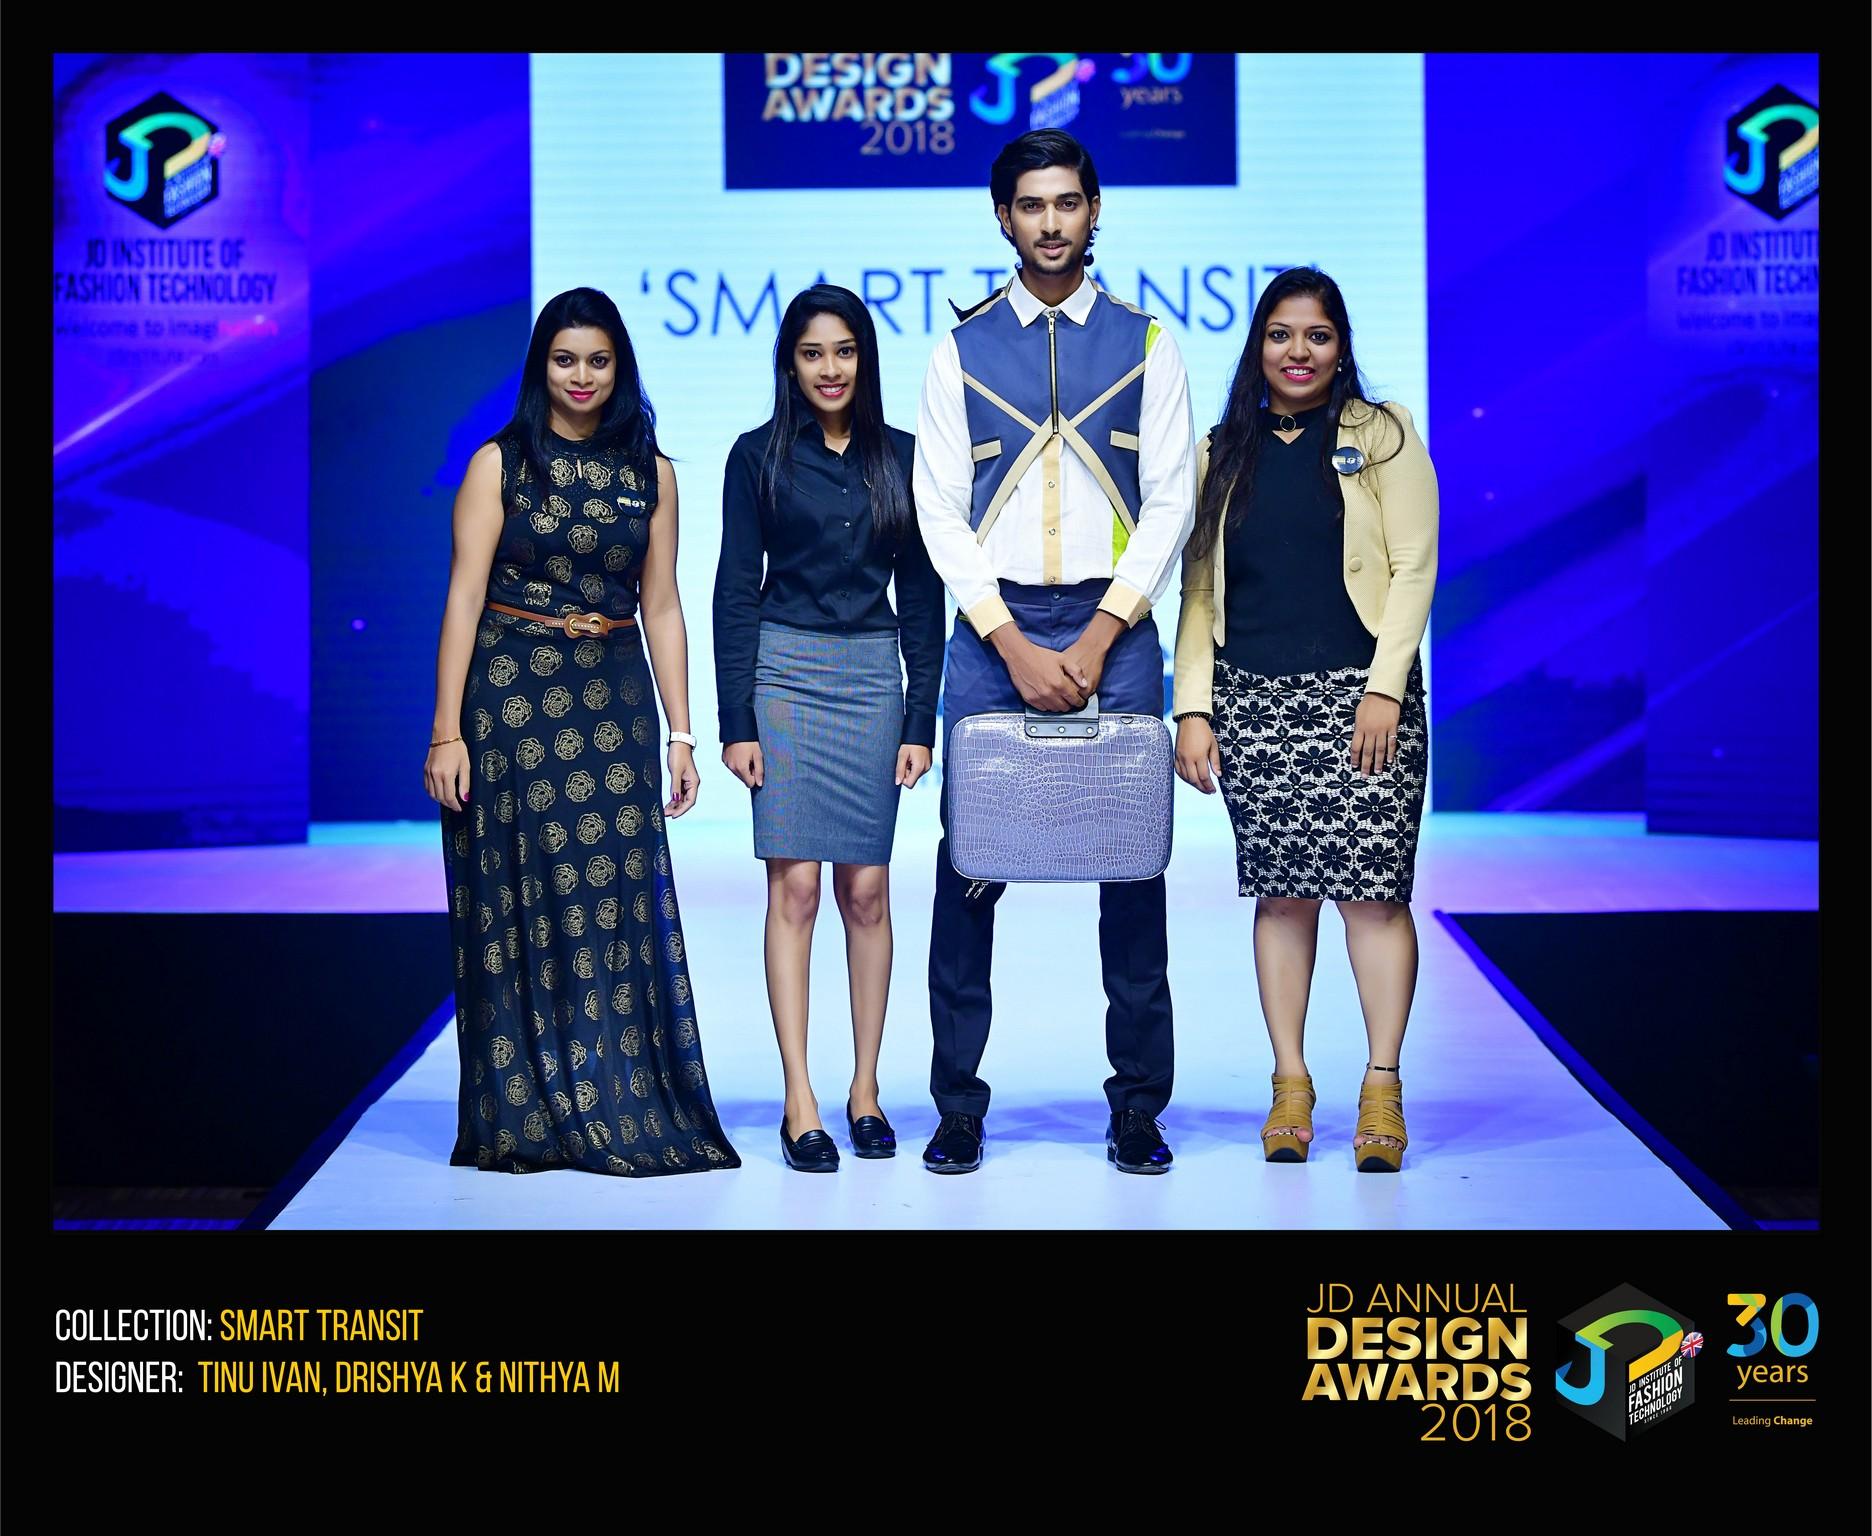 Smart Transit – Change – JD Annual Design Awards 2018 | Designer: Tinu, Nitya, Drishya | Photography : Jerin Nath (@jerin_nath) smart transit - SMART TRANSIT 8 - Smart Transit – Change – JD Annual Design Awards 2018